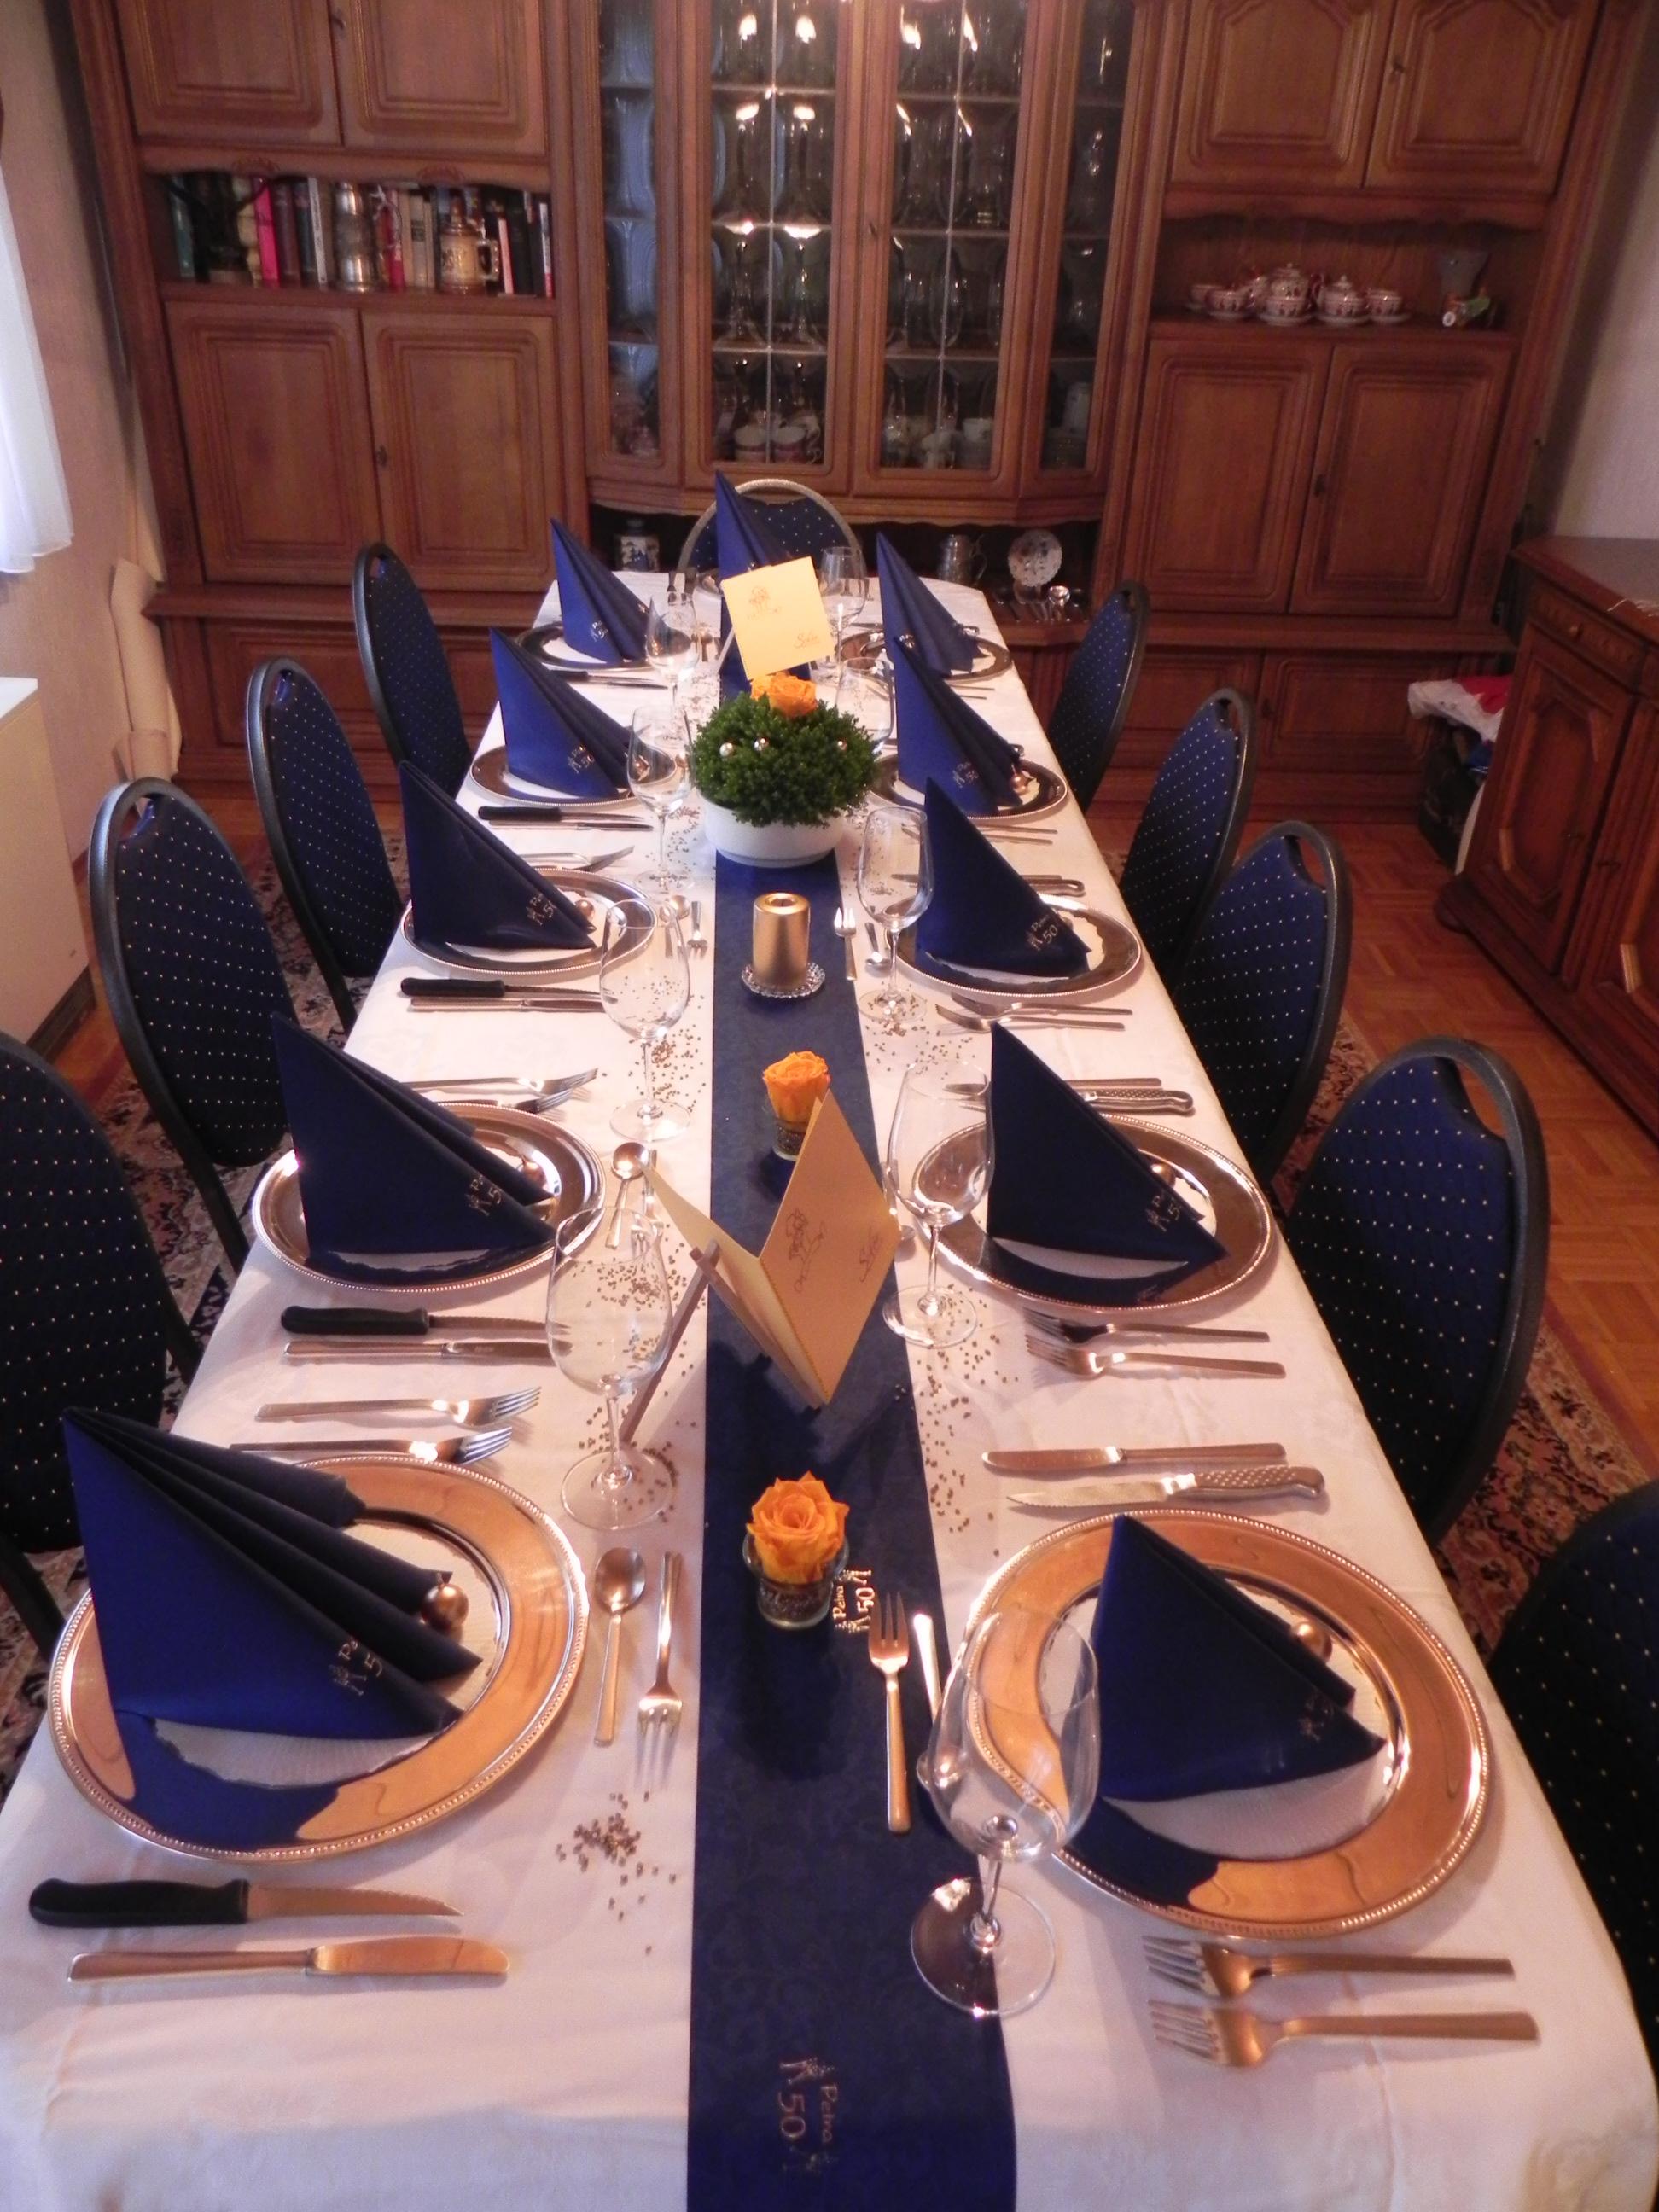 Deko Menukarten Tischdekoration Kerzen Dscn0353